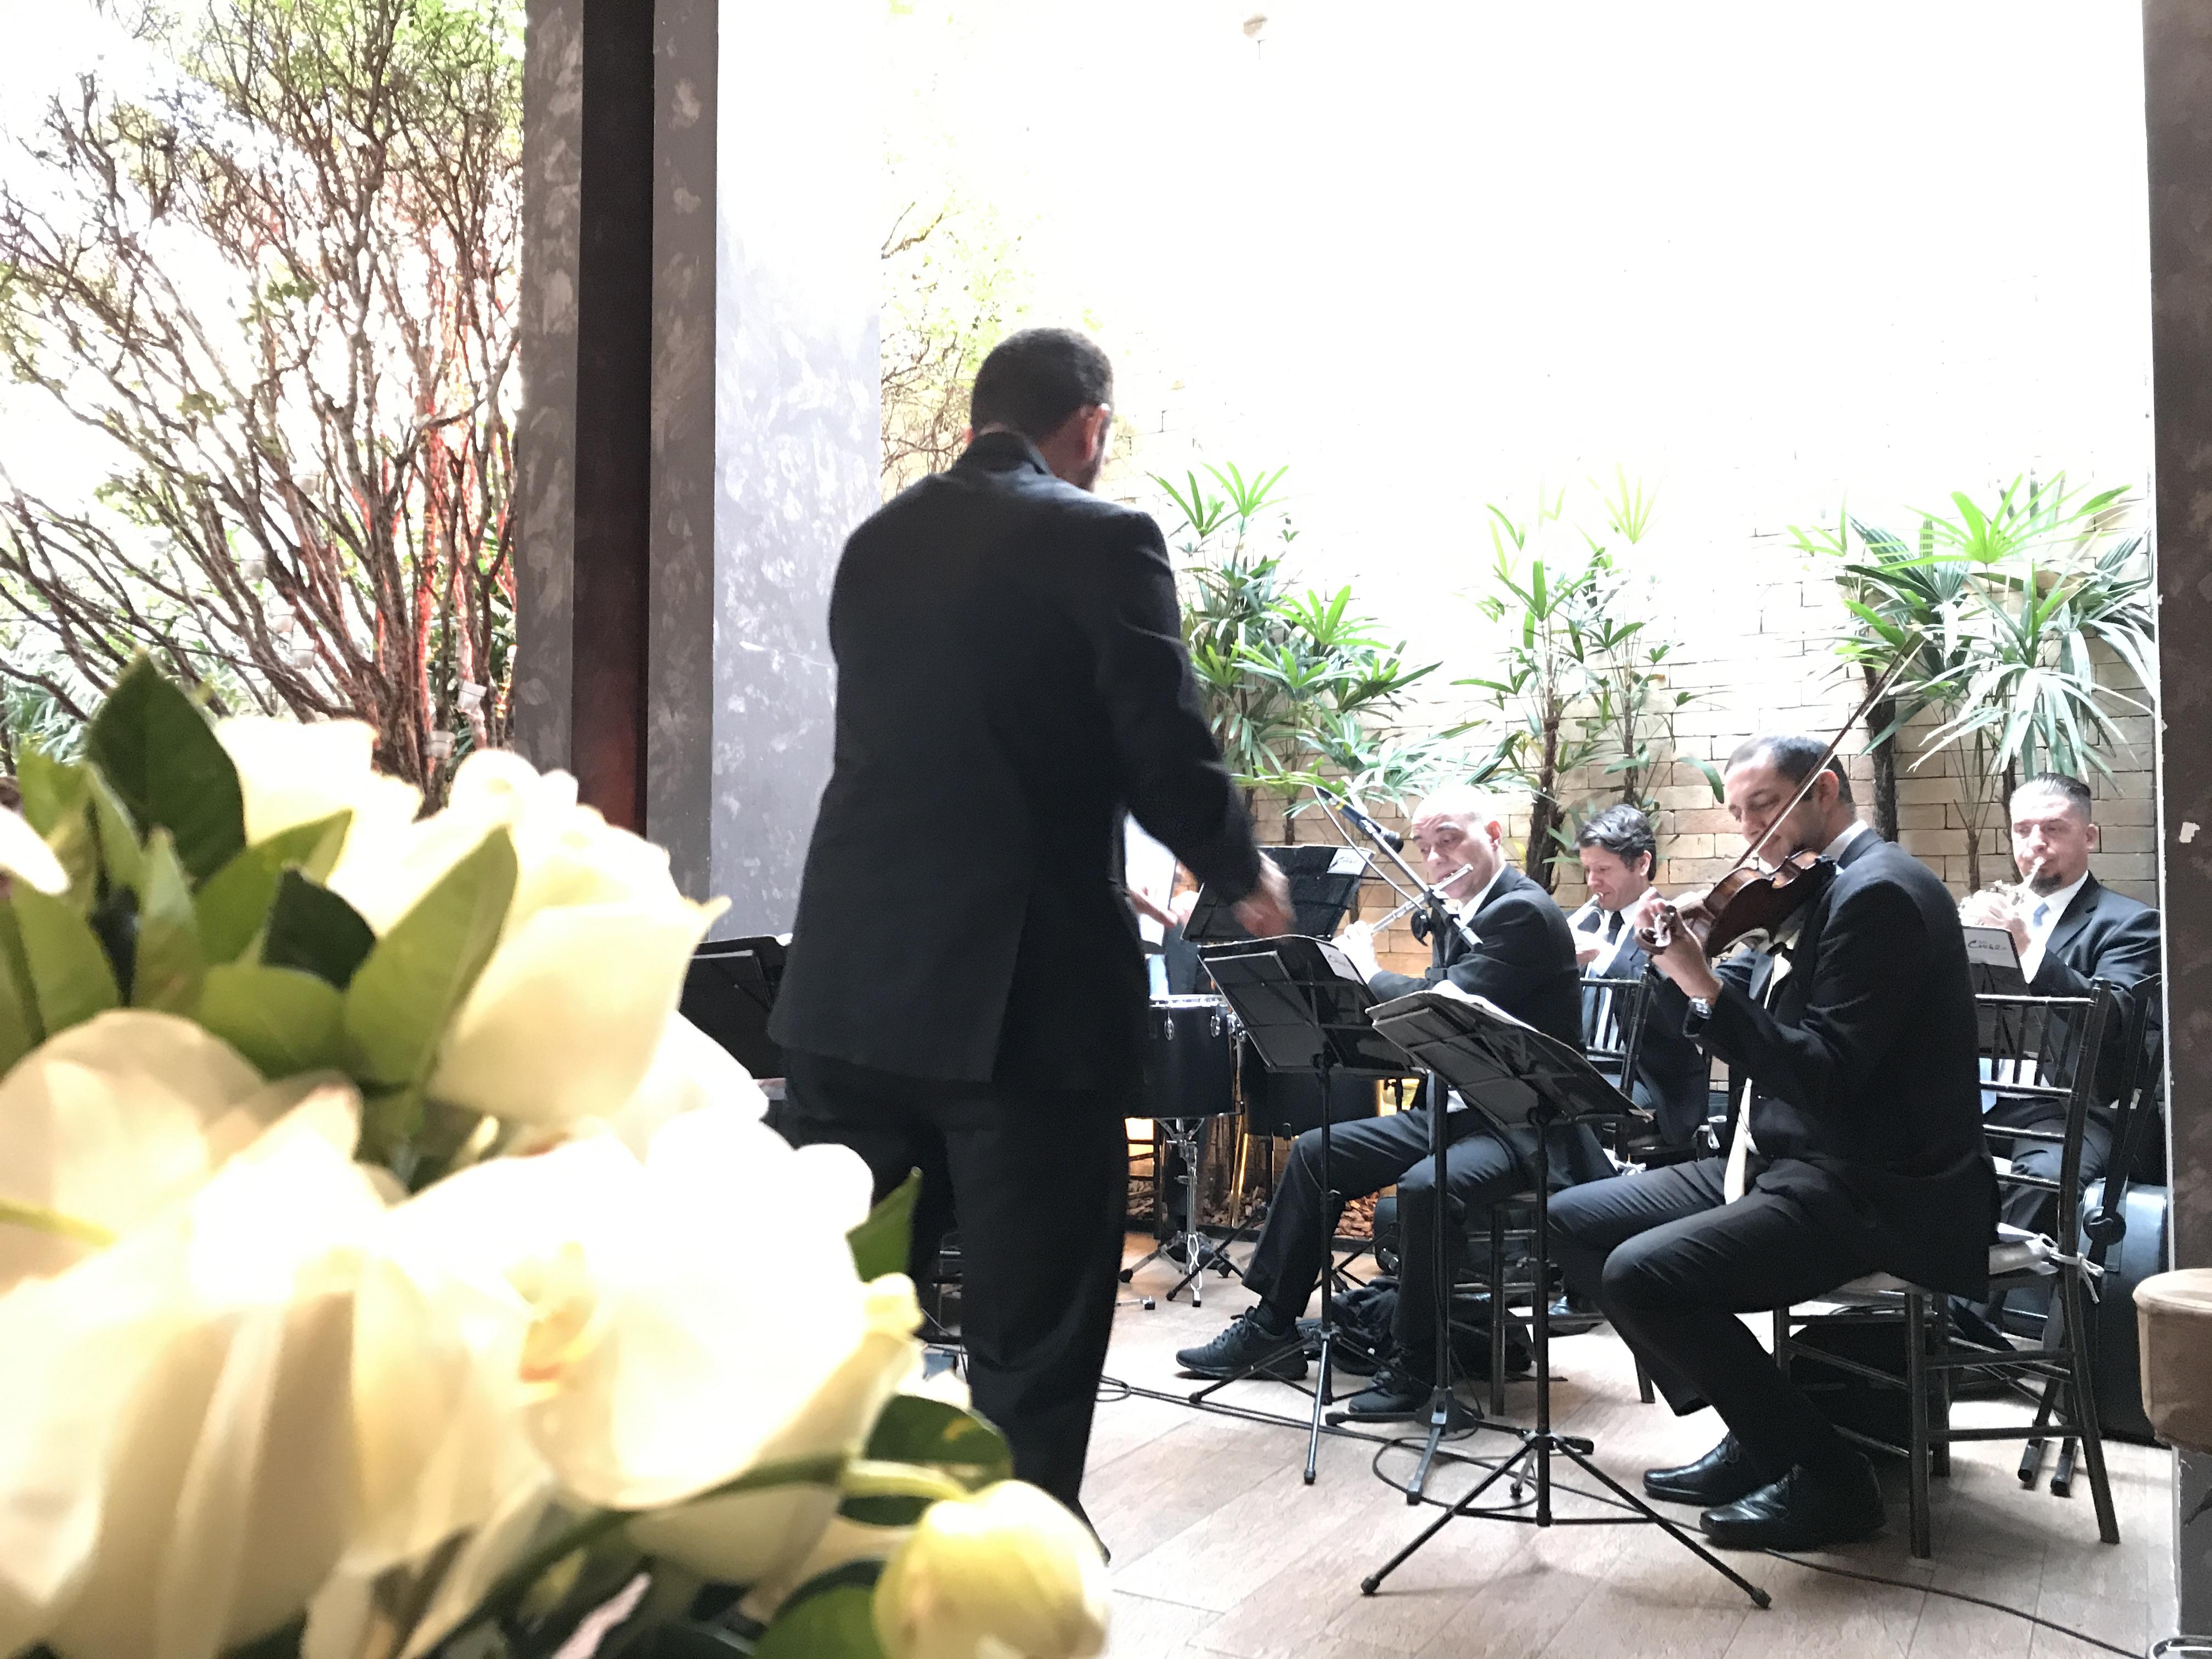 tutti-flora-decoracao-flores-casamento-convencao-boho-eventos-producao-buque-noiva-debutante-coral-orquestra-delchiaro